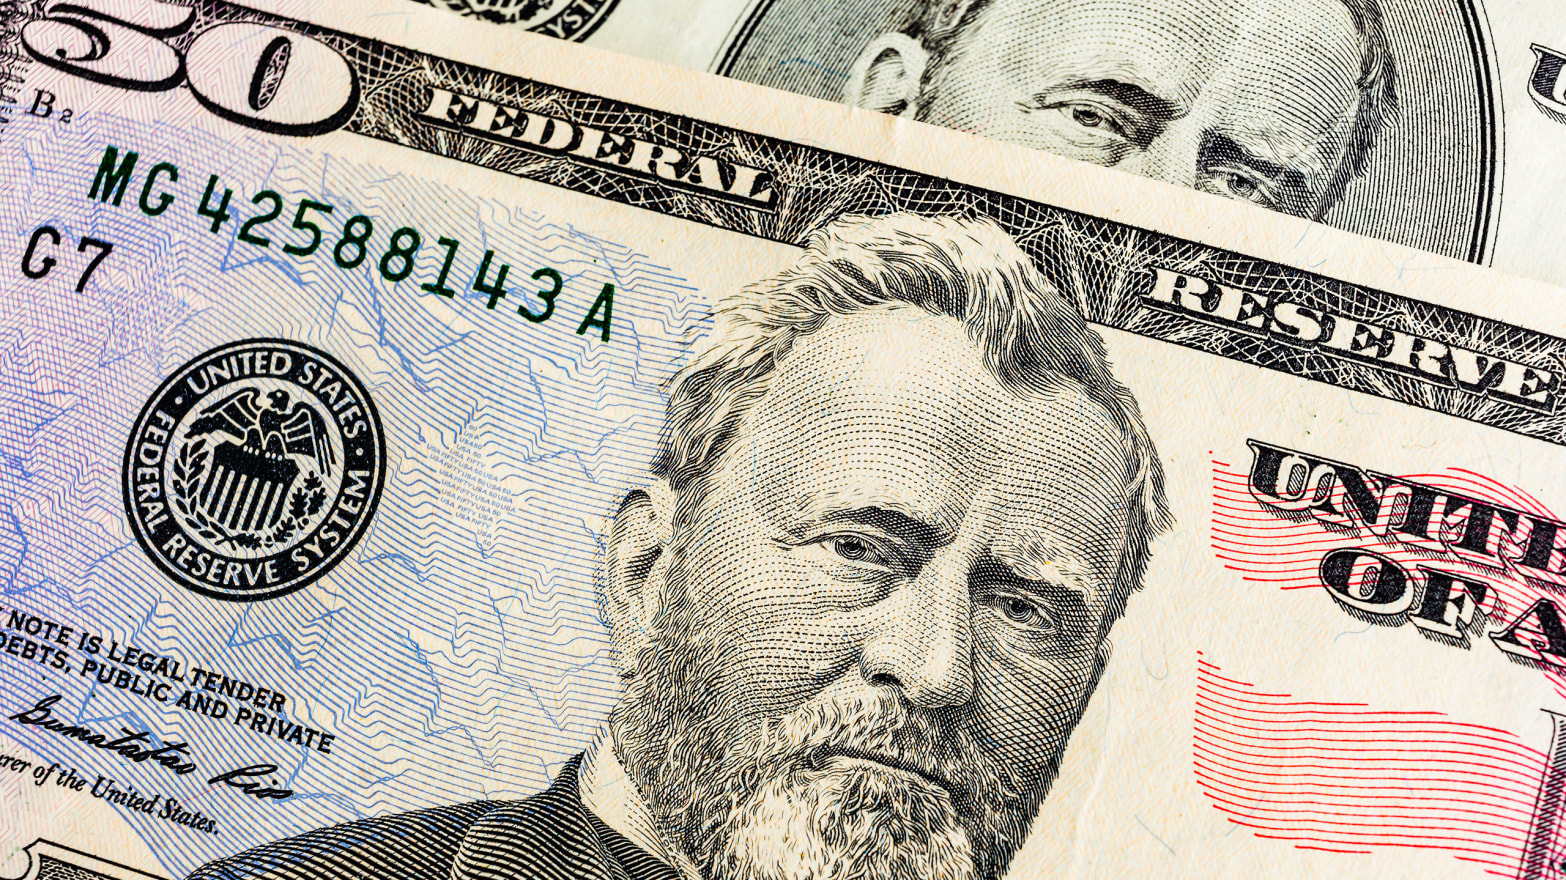 U.S. Grant Is U.S. History's Mystery Man